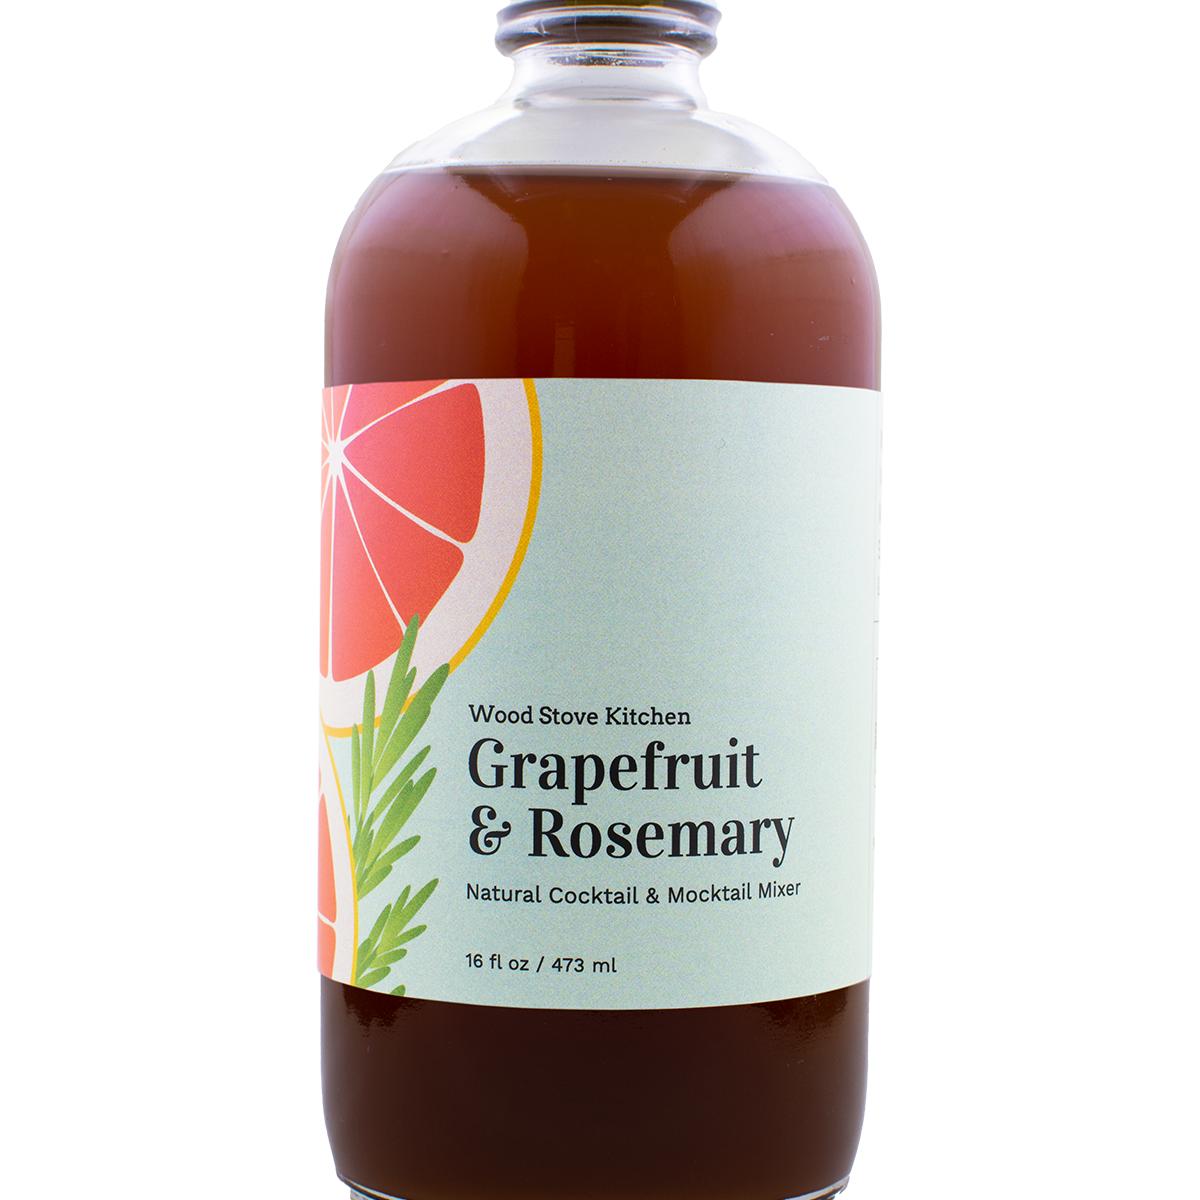 Grapefruit & Rosemary Cocktail Mixer